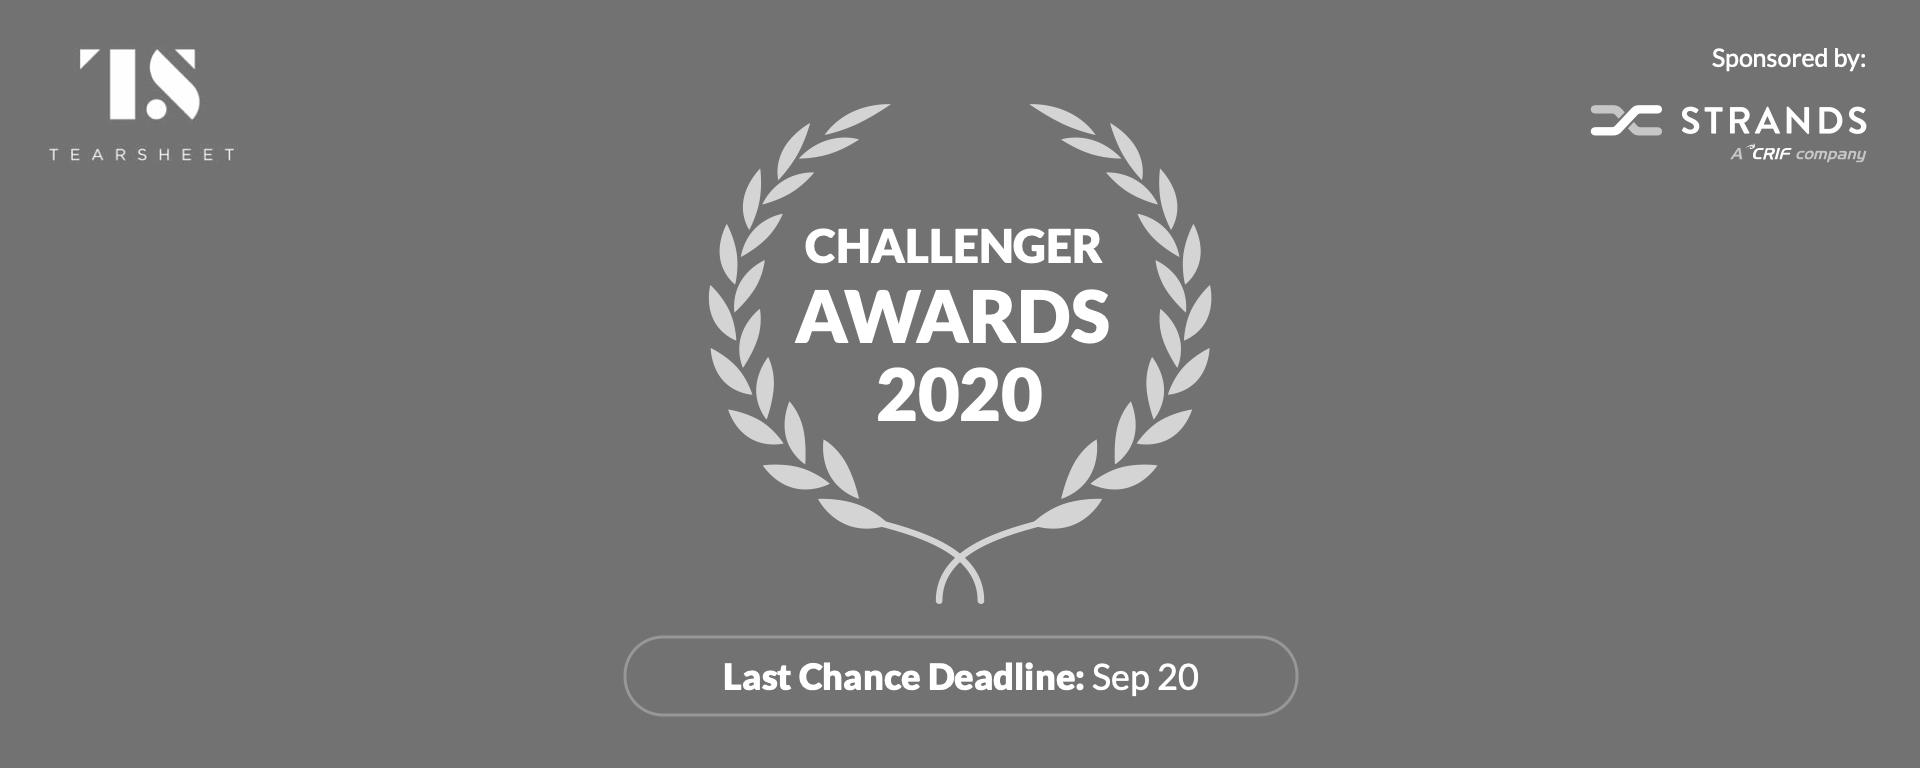 Challenger Awards 2020